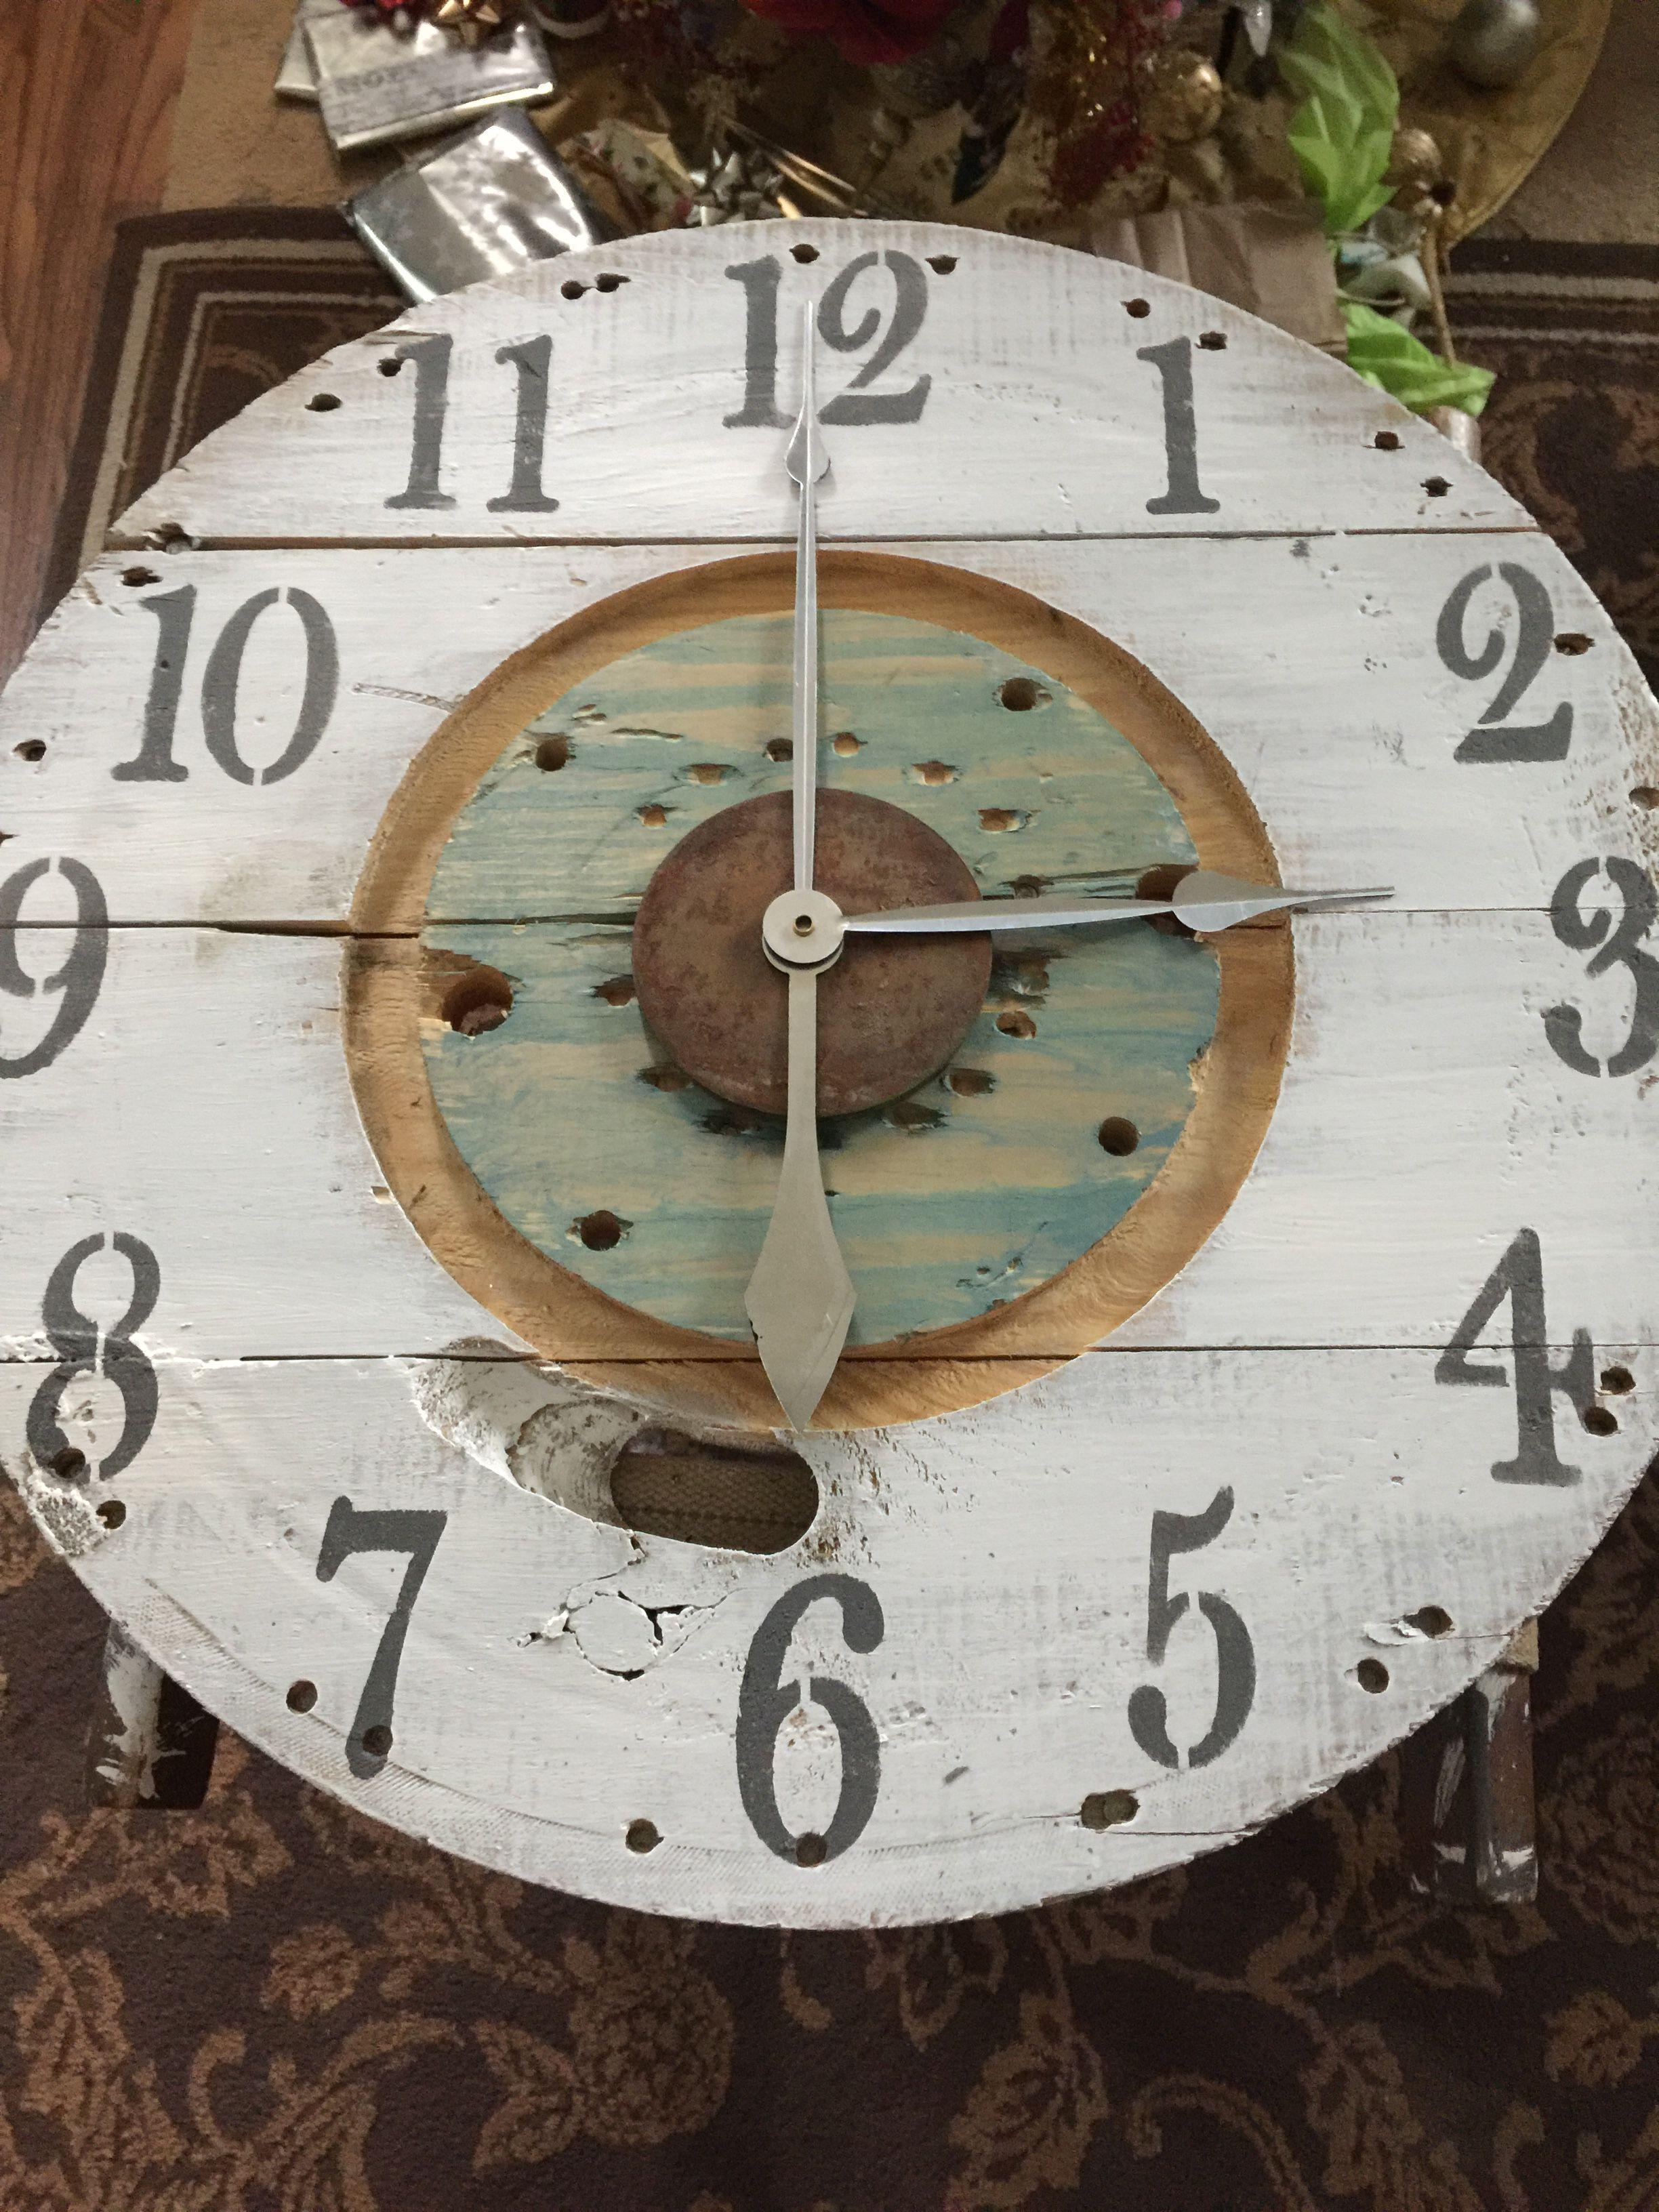 Urbanchic Designs Spool Clock For Sale All Custom Designs 23 Shipping Available Vintage Wall Clock Big Wall Clocks Clock Wall Art